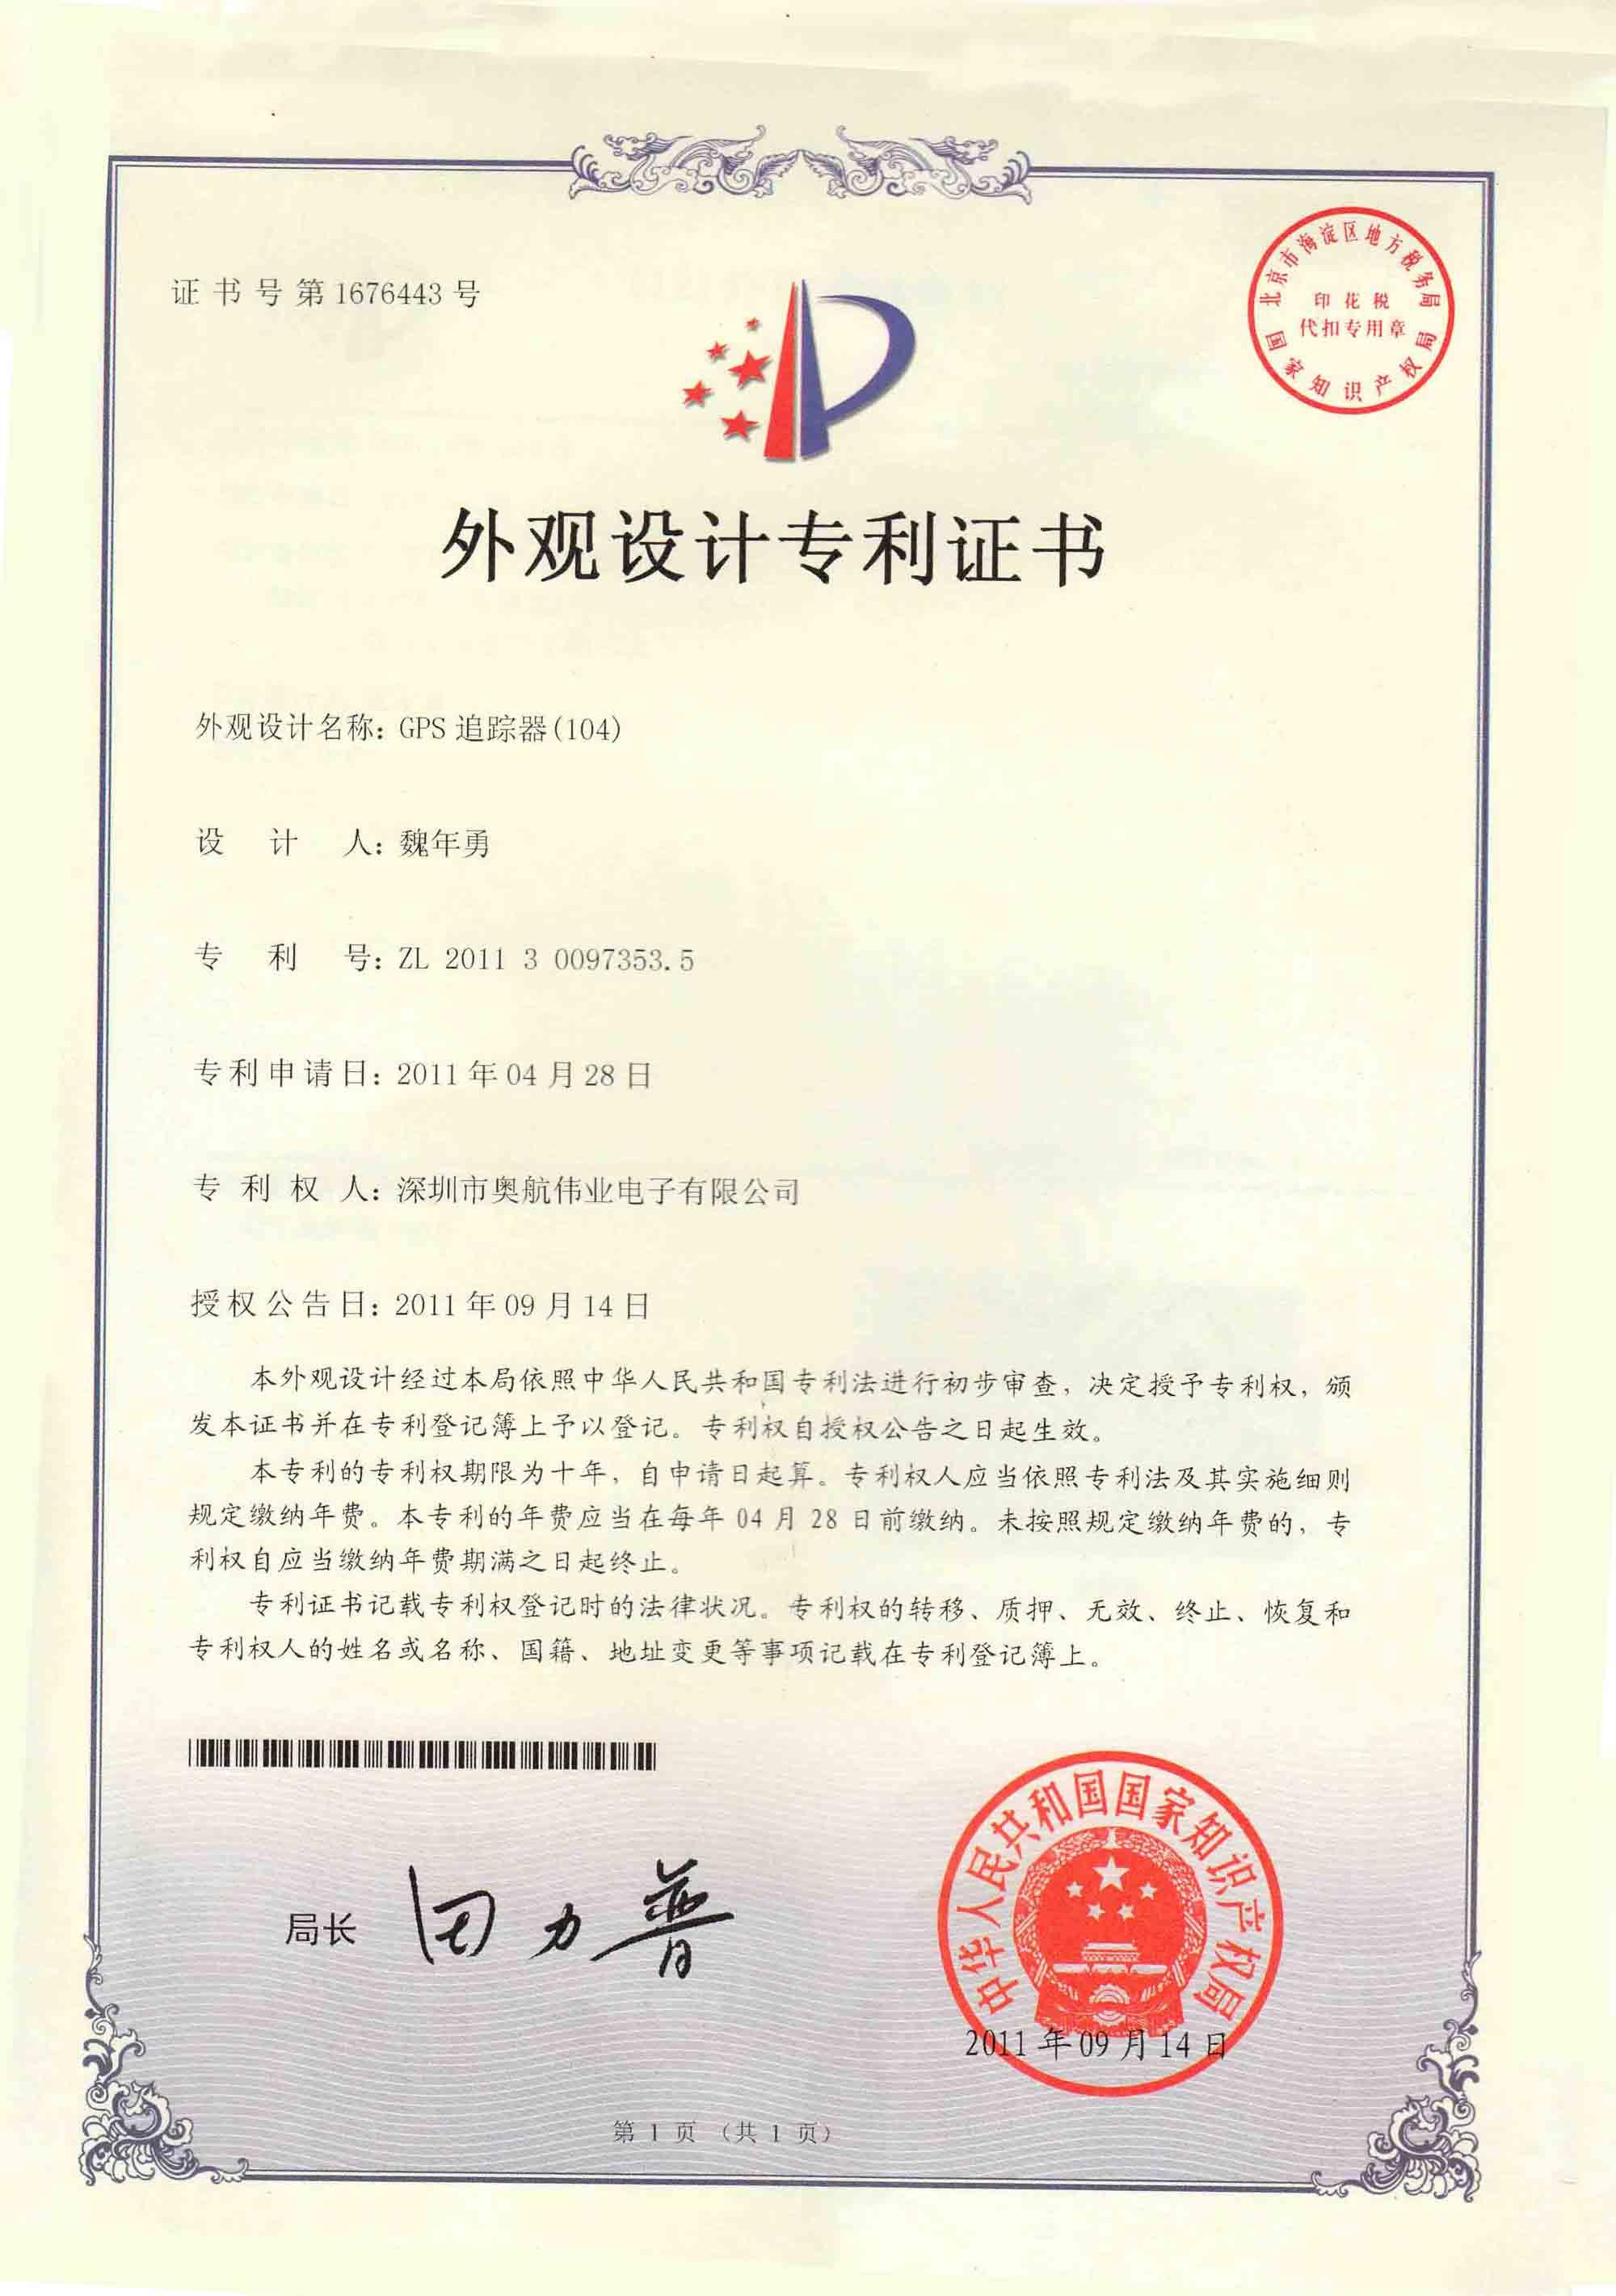 GPS104 patent